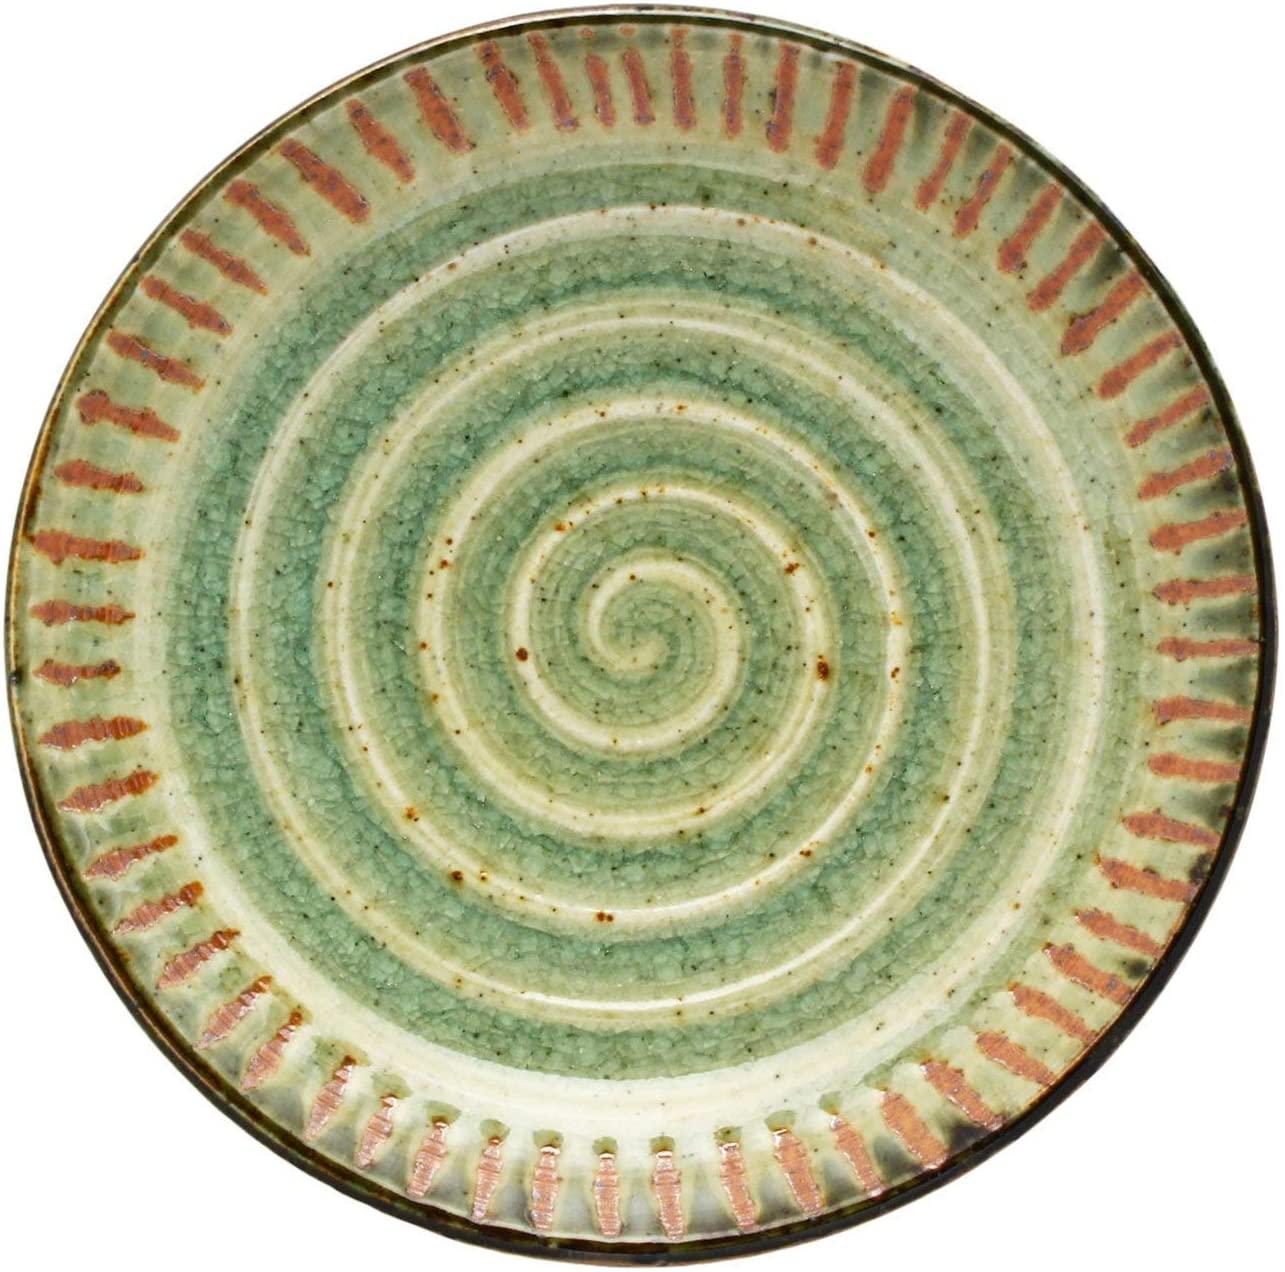 SETO Ware Plate TOKUSA 16.5 cm